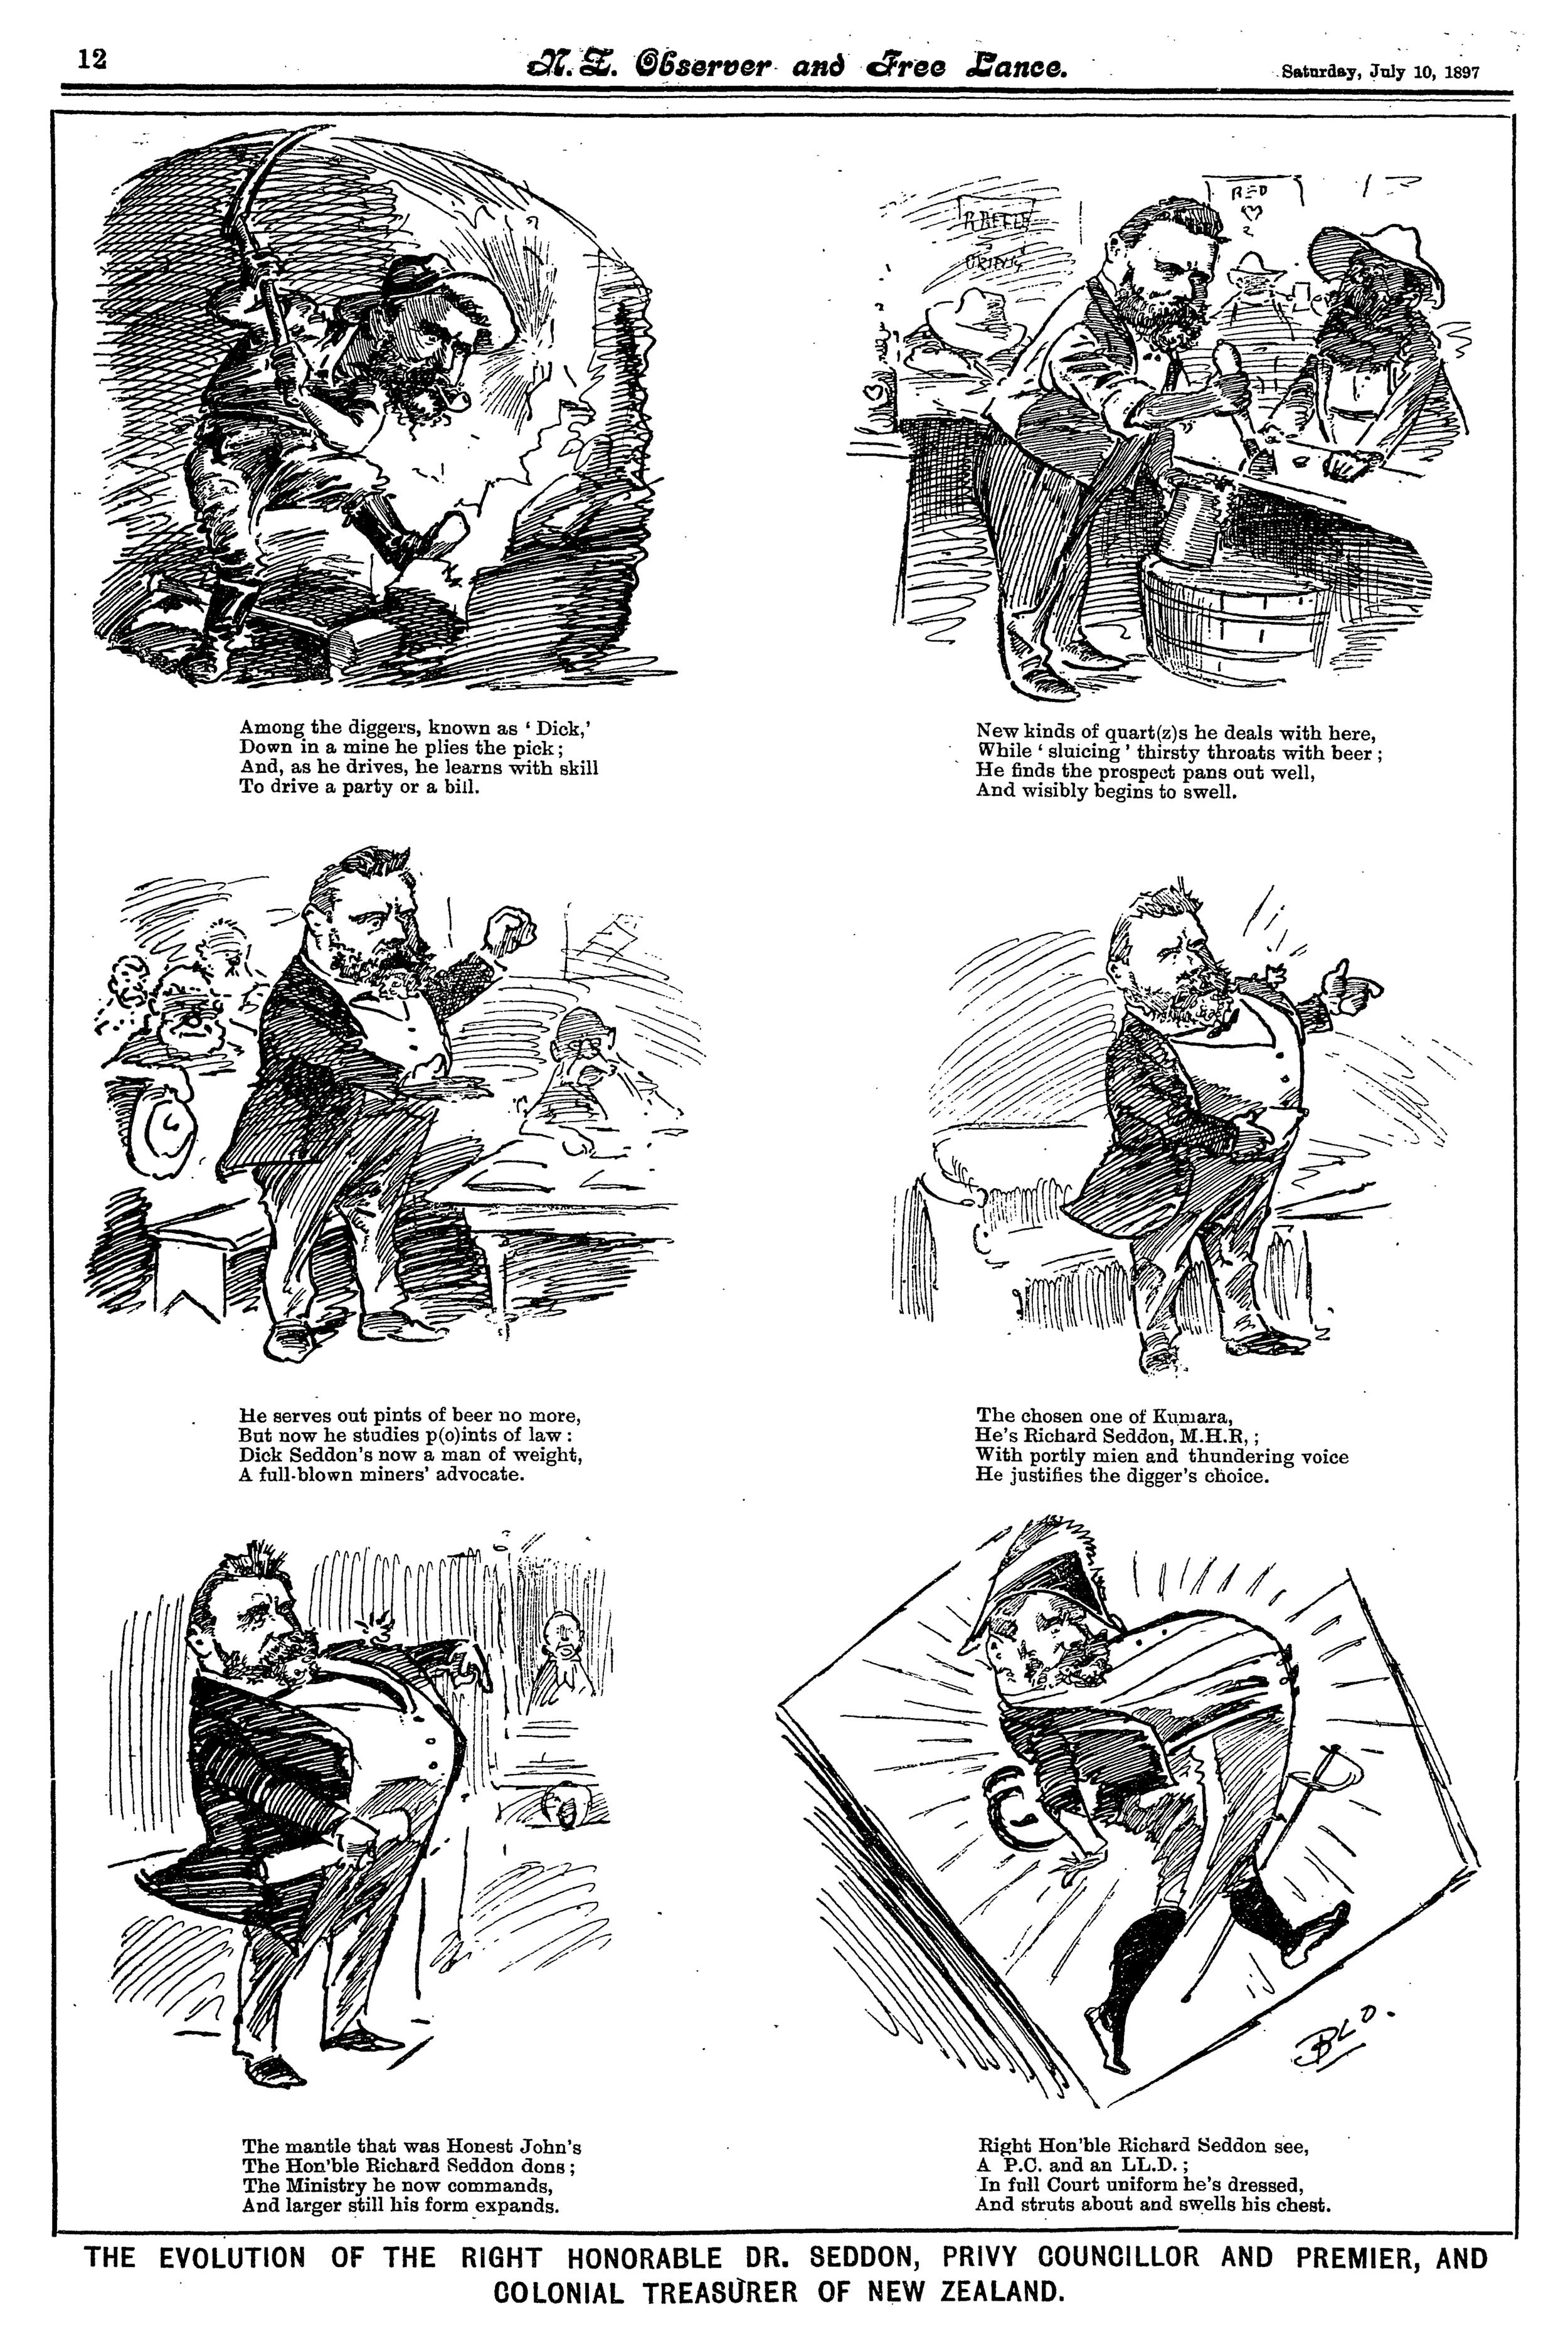 'The Chosen One of Kumara' -caricatures of Richard Seddon were common.